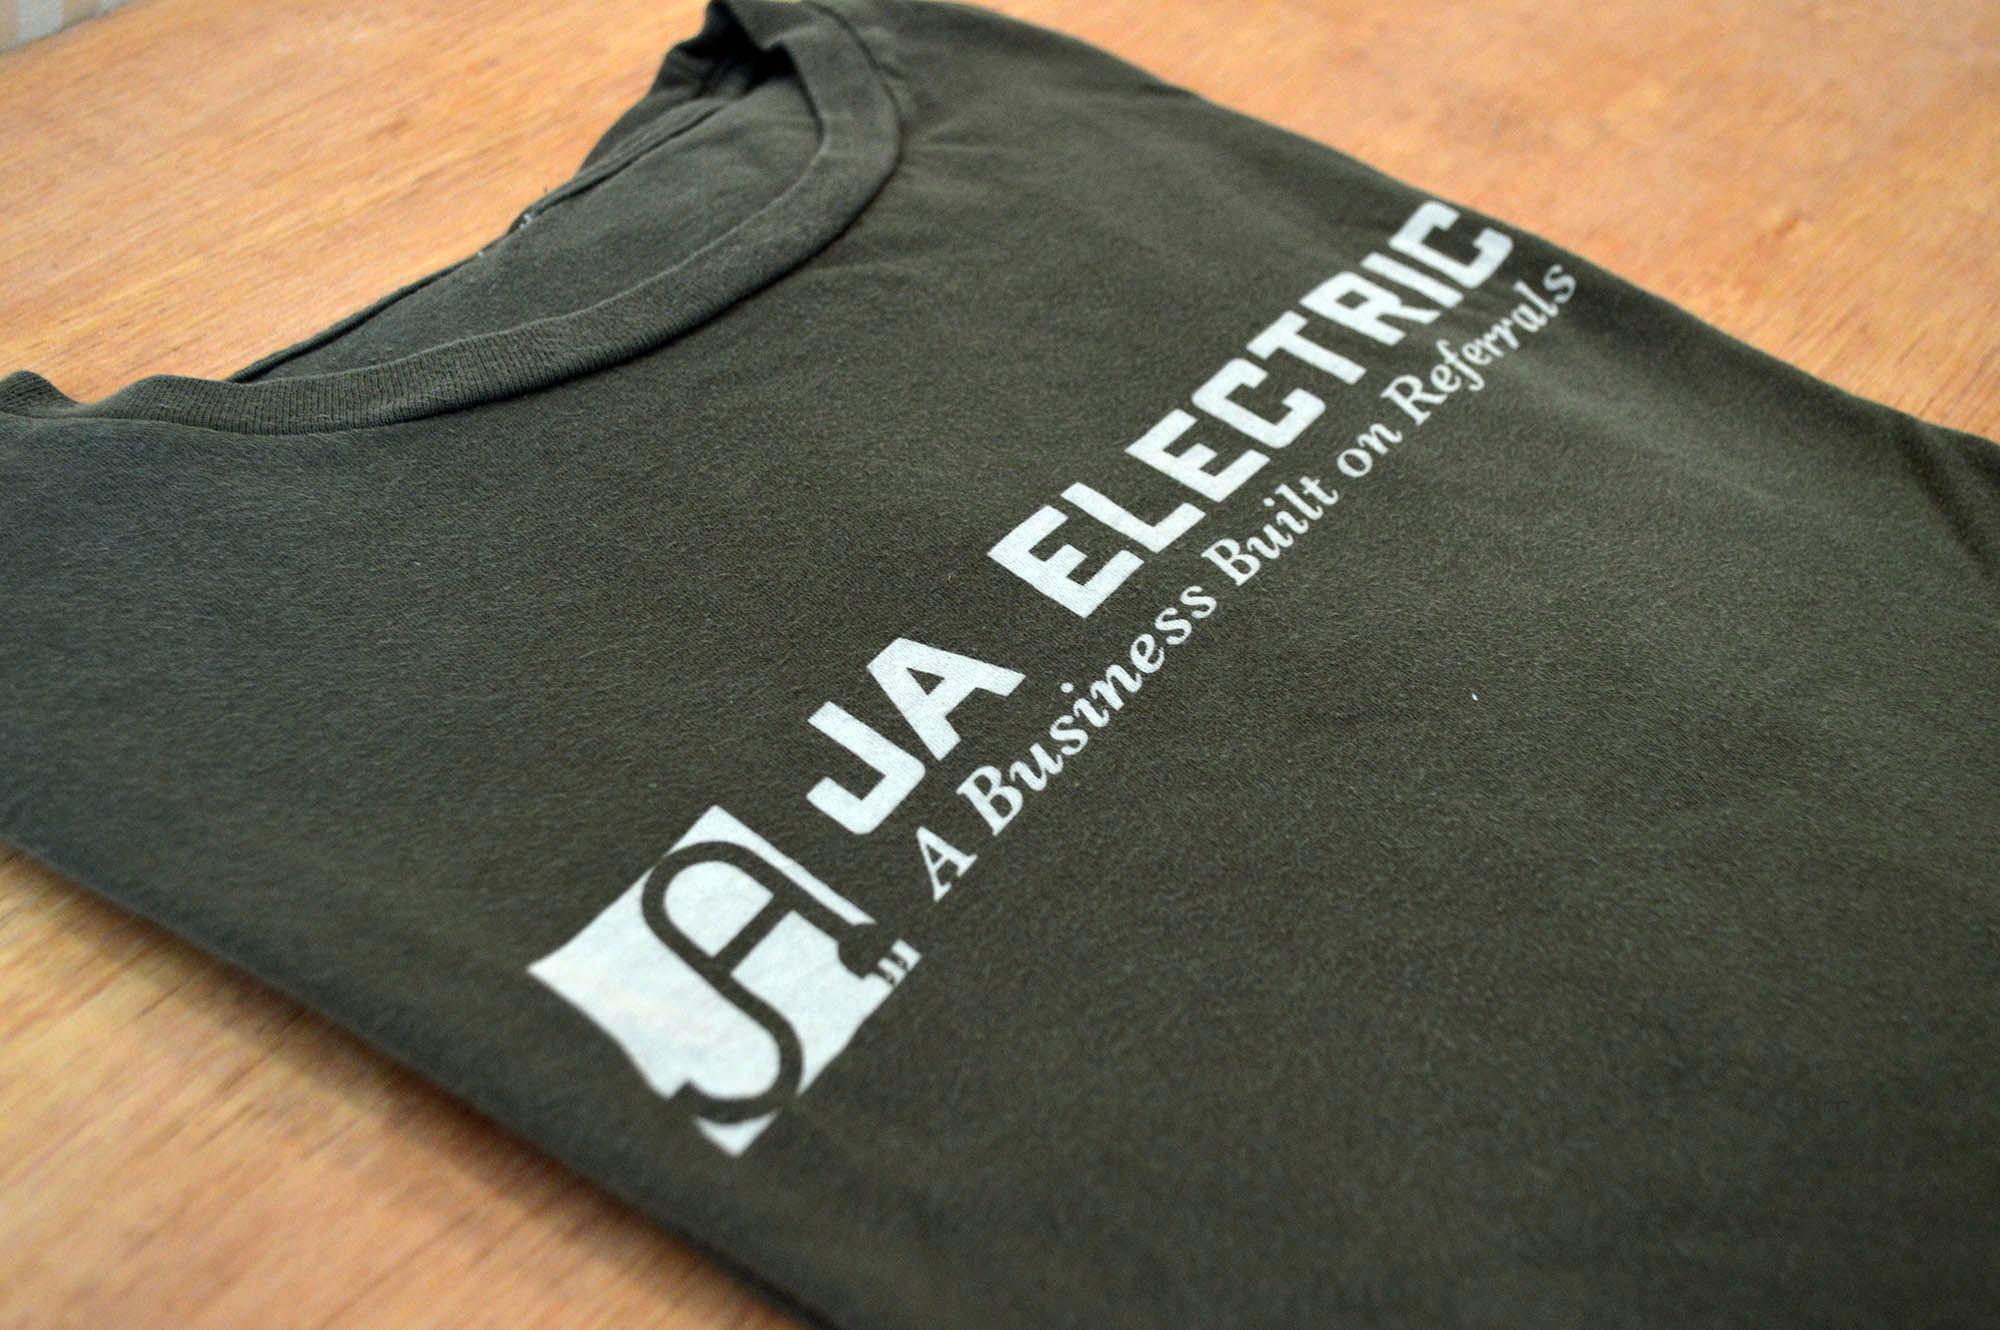 Older discharge print shirt